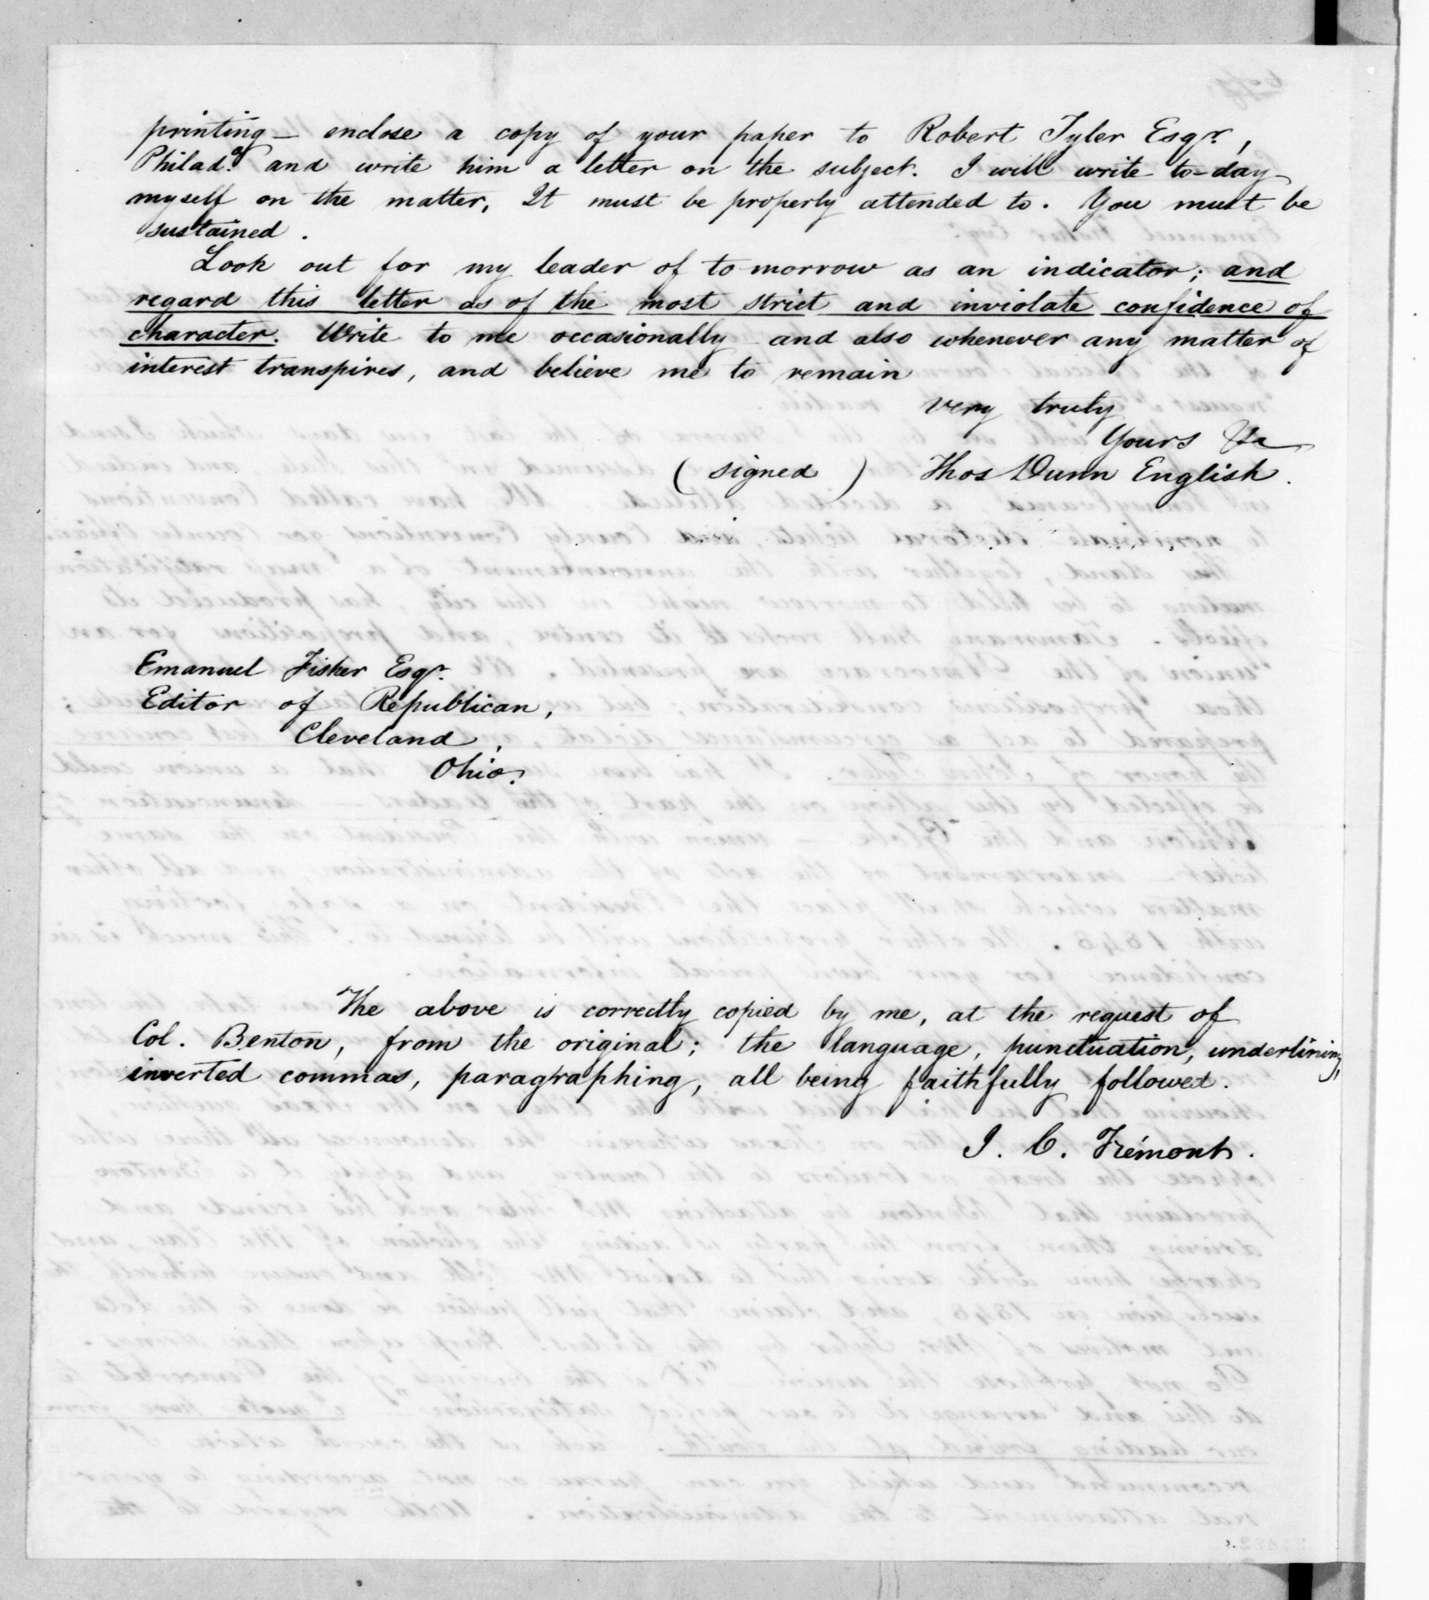 Thomas Dunn English to Emanuel Fisher, July 22, 1844